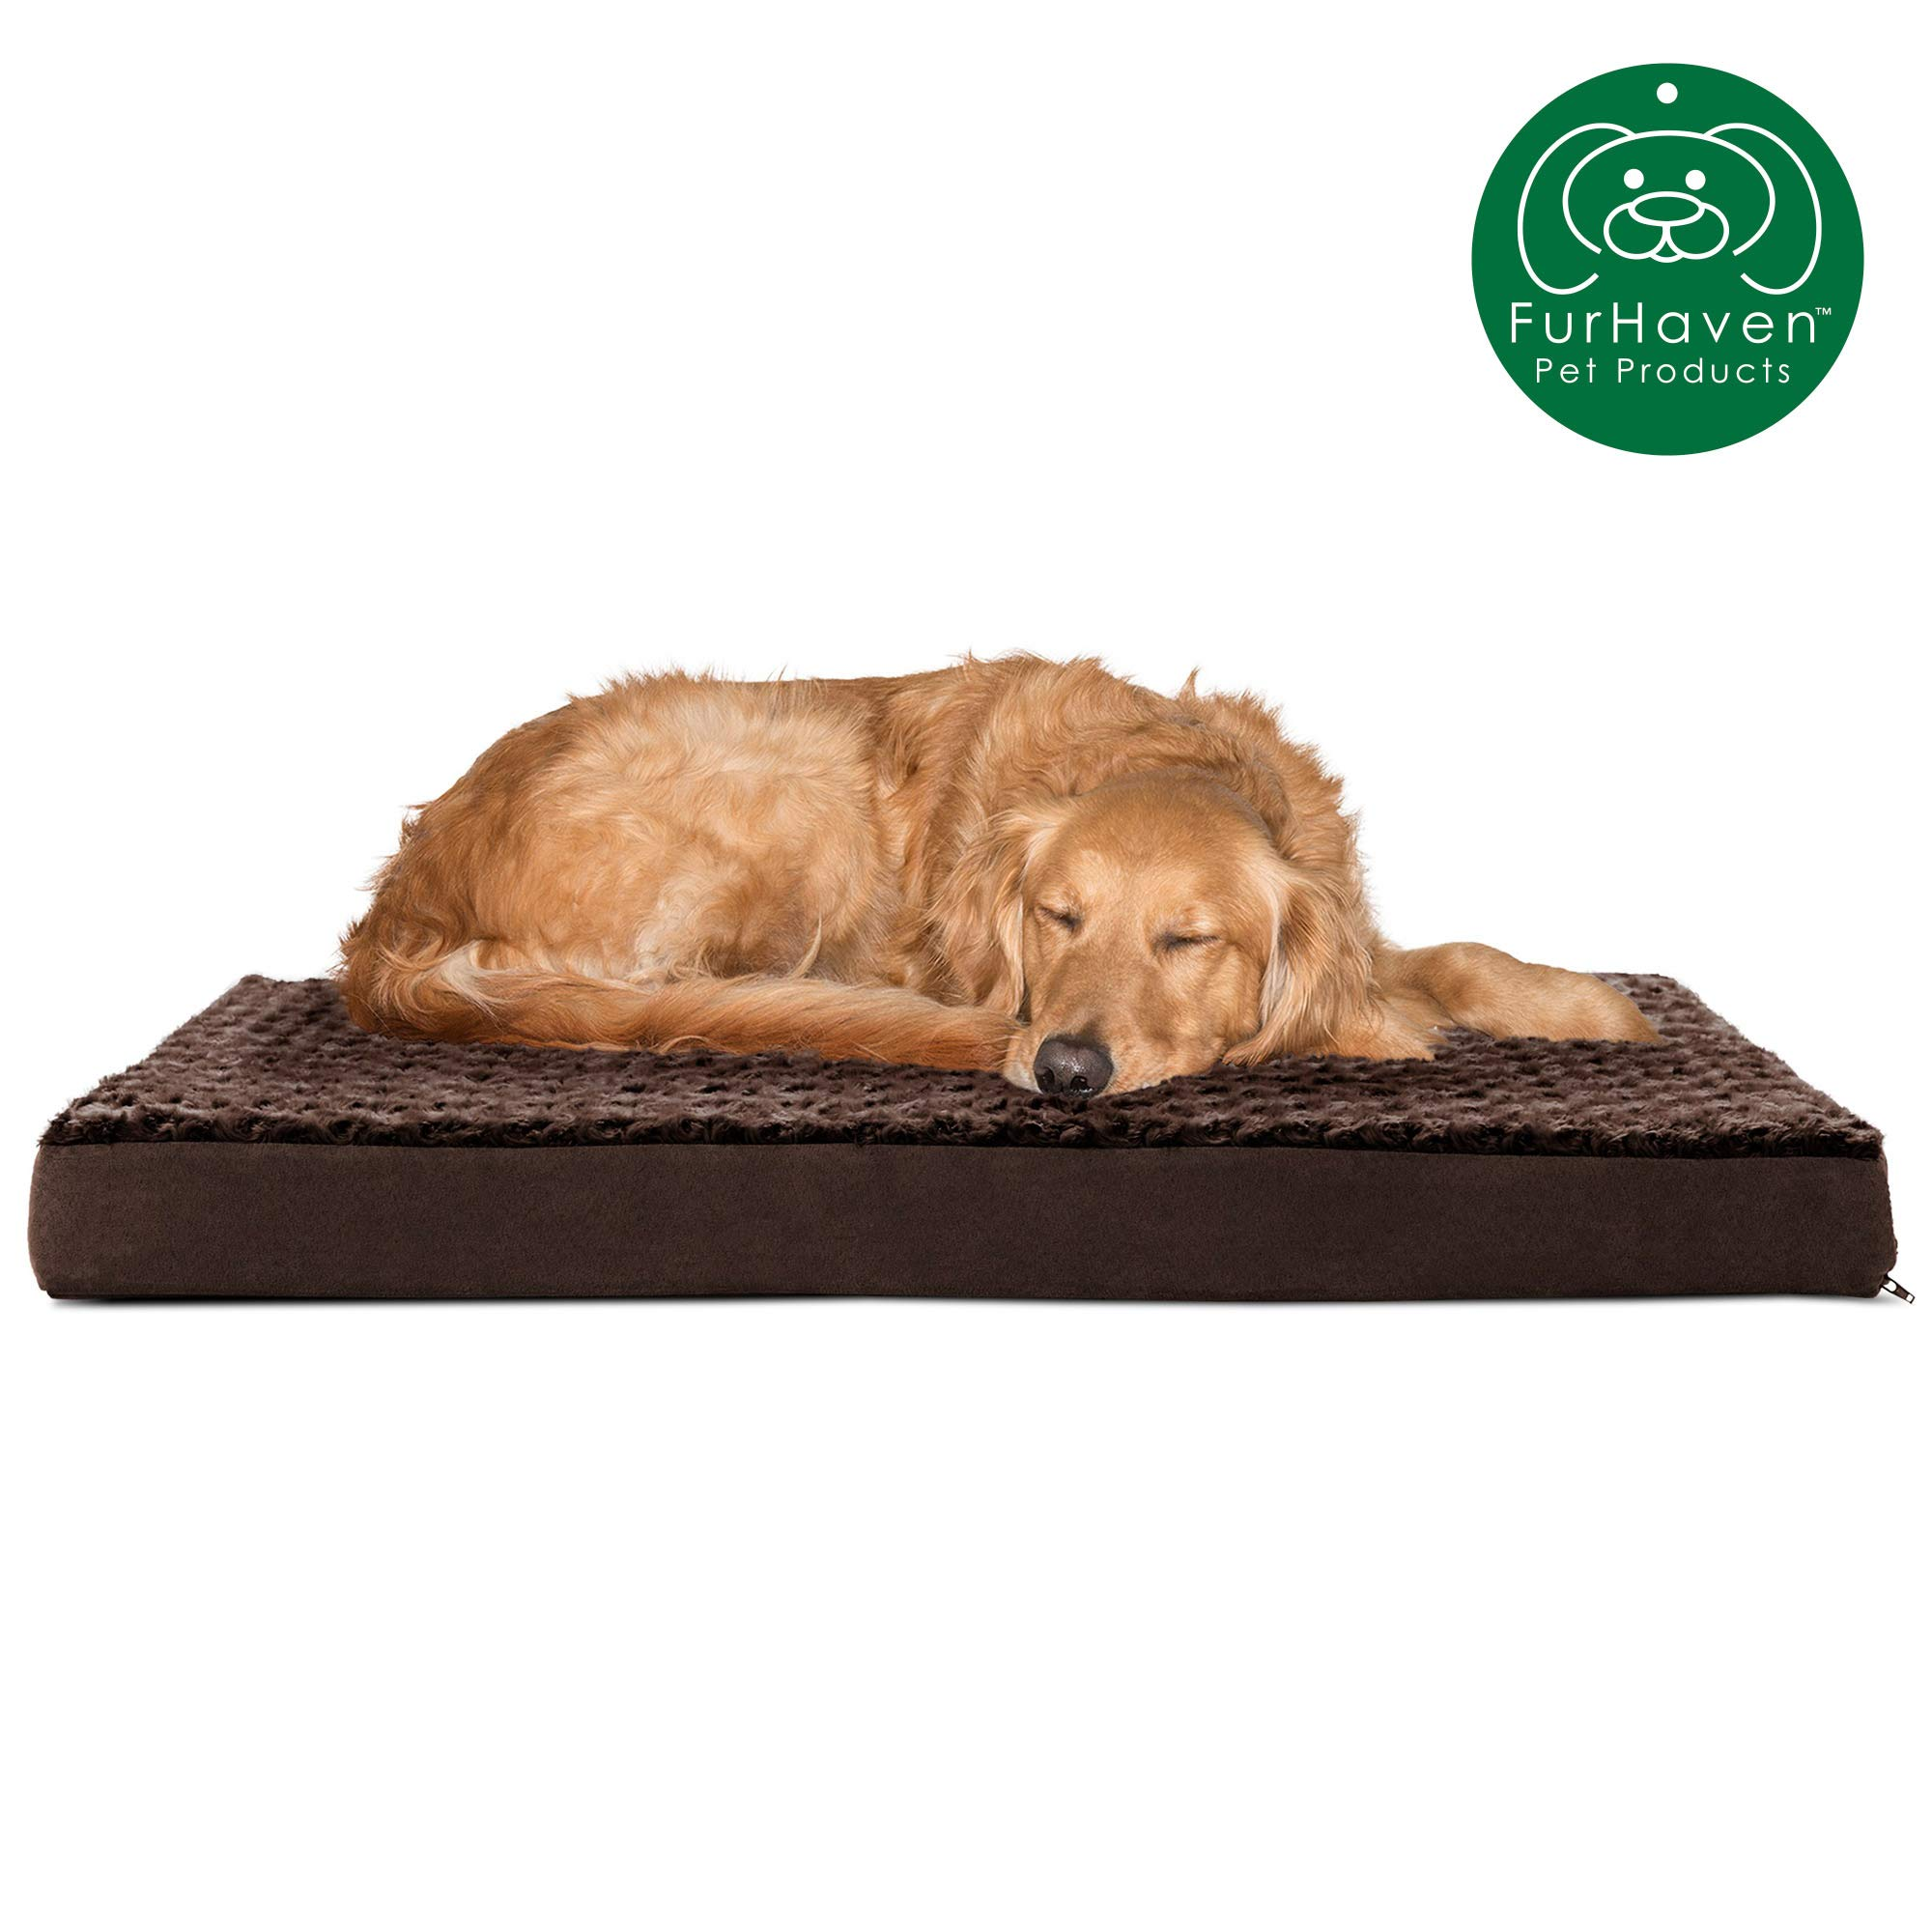 FurHaven Pet Orthopedic Mattress Chocolate